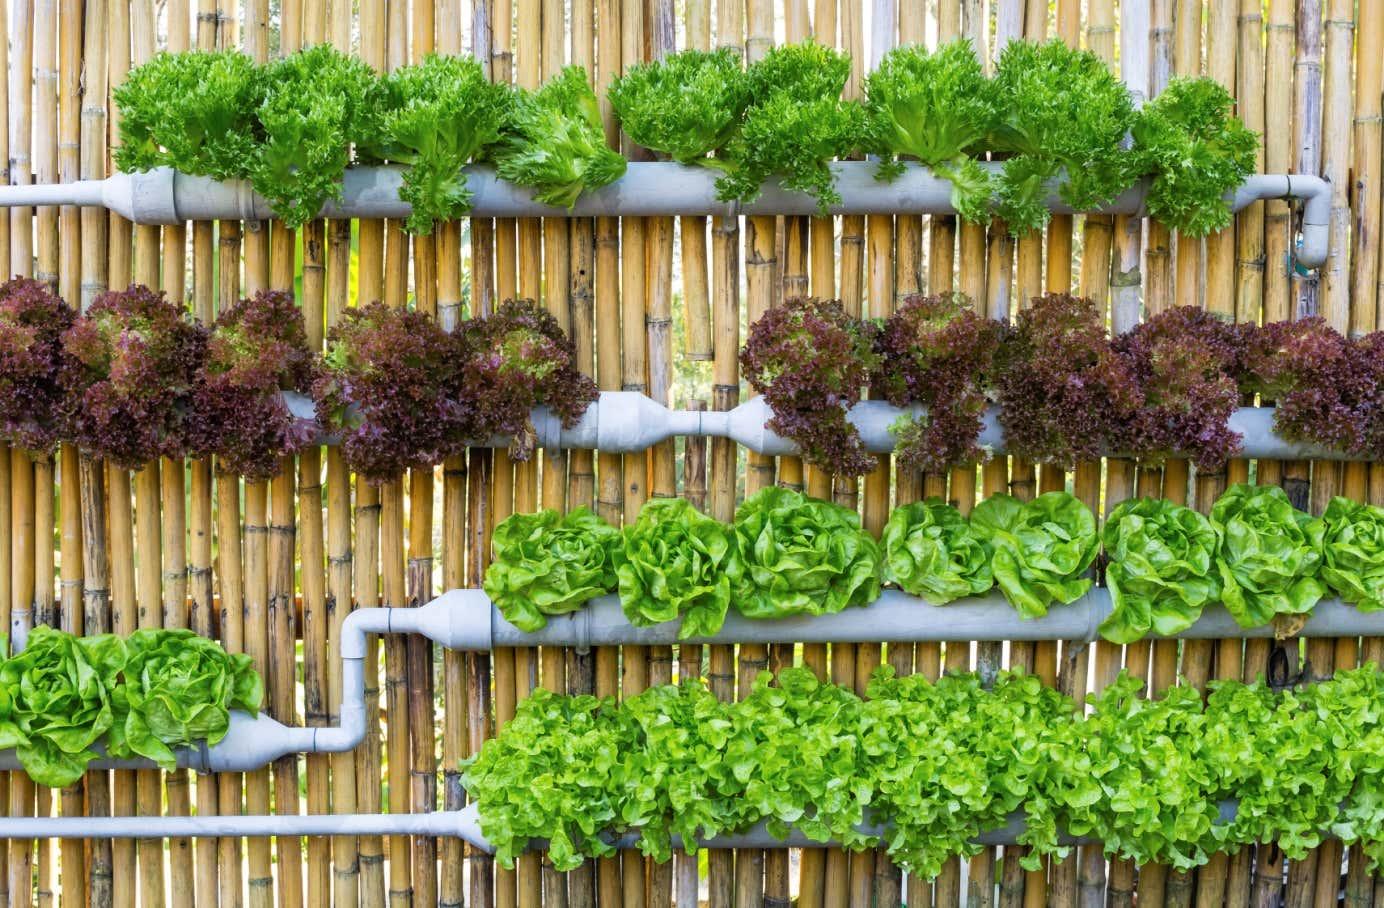 Hängende Gärten: Pflanzen Vertikal Anbauen Vertikale Bepflanzung Ideen Tipps Garten